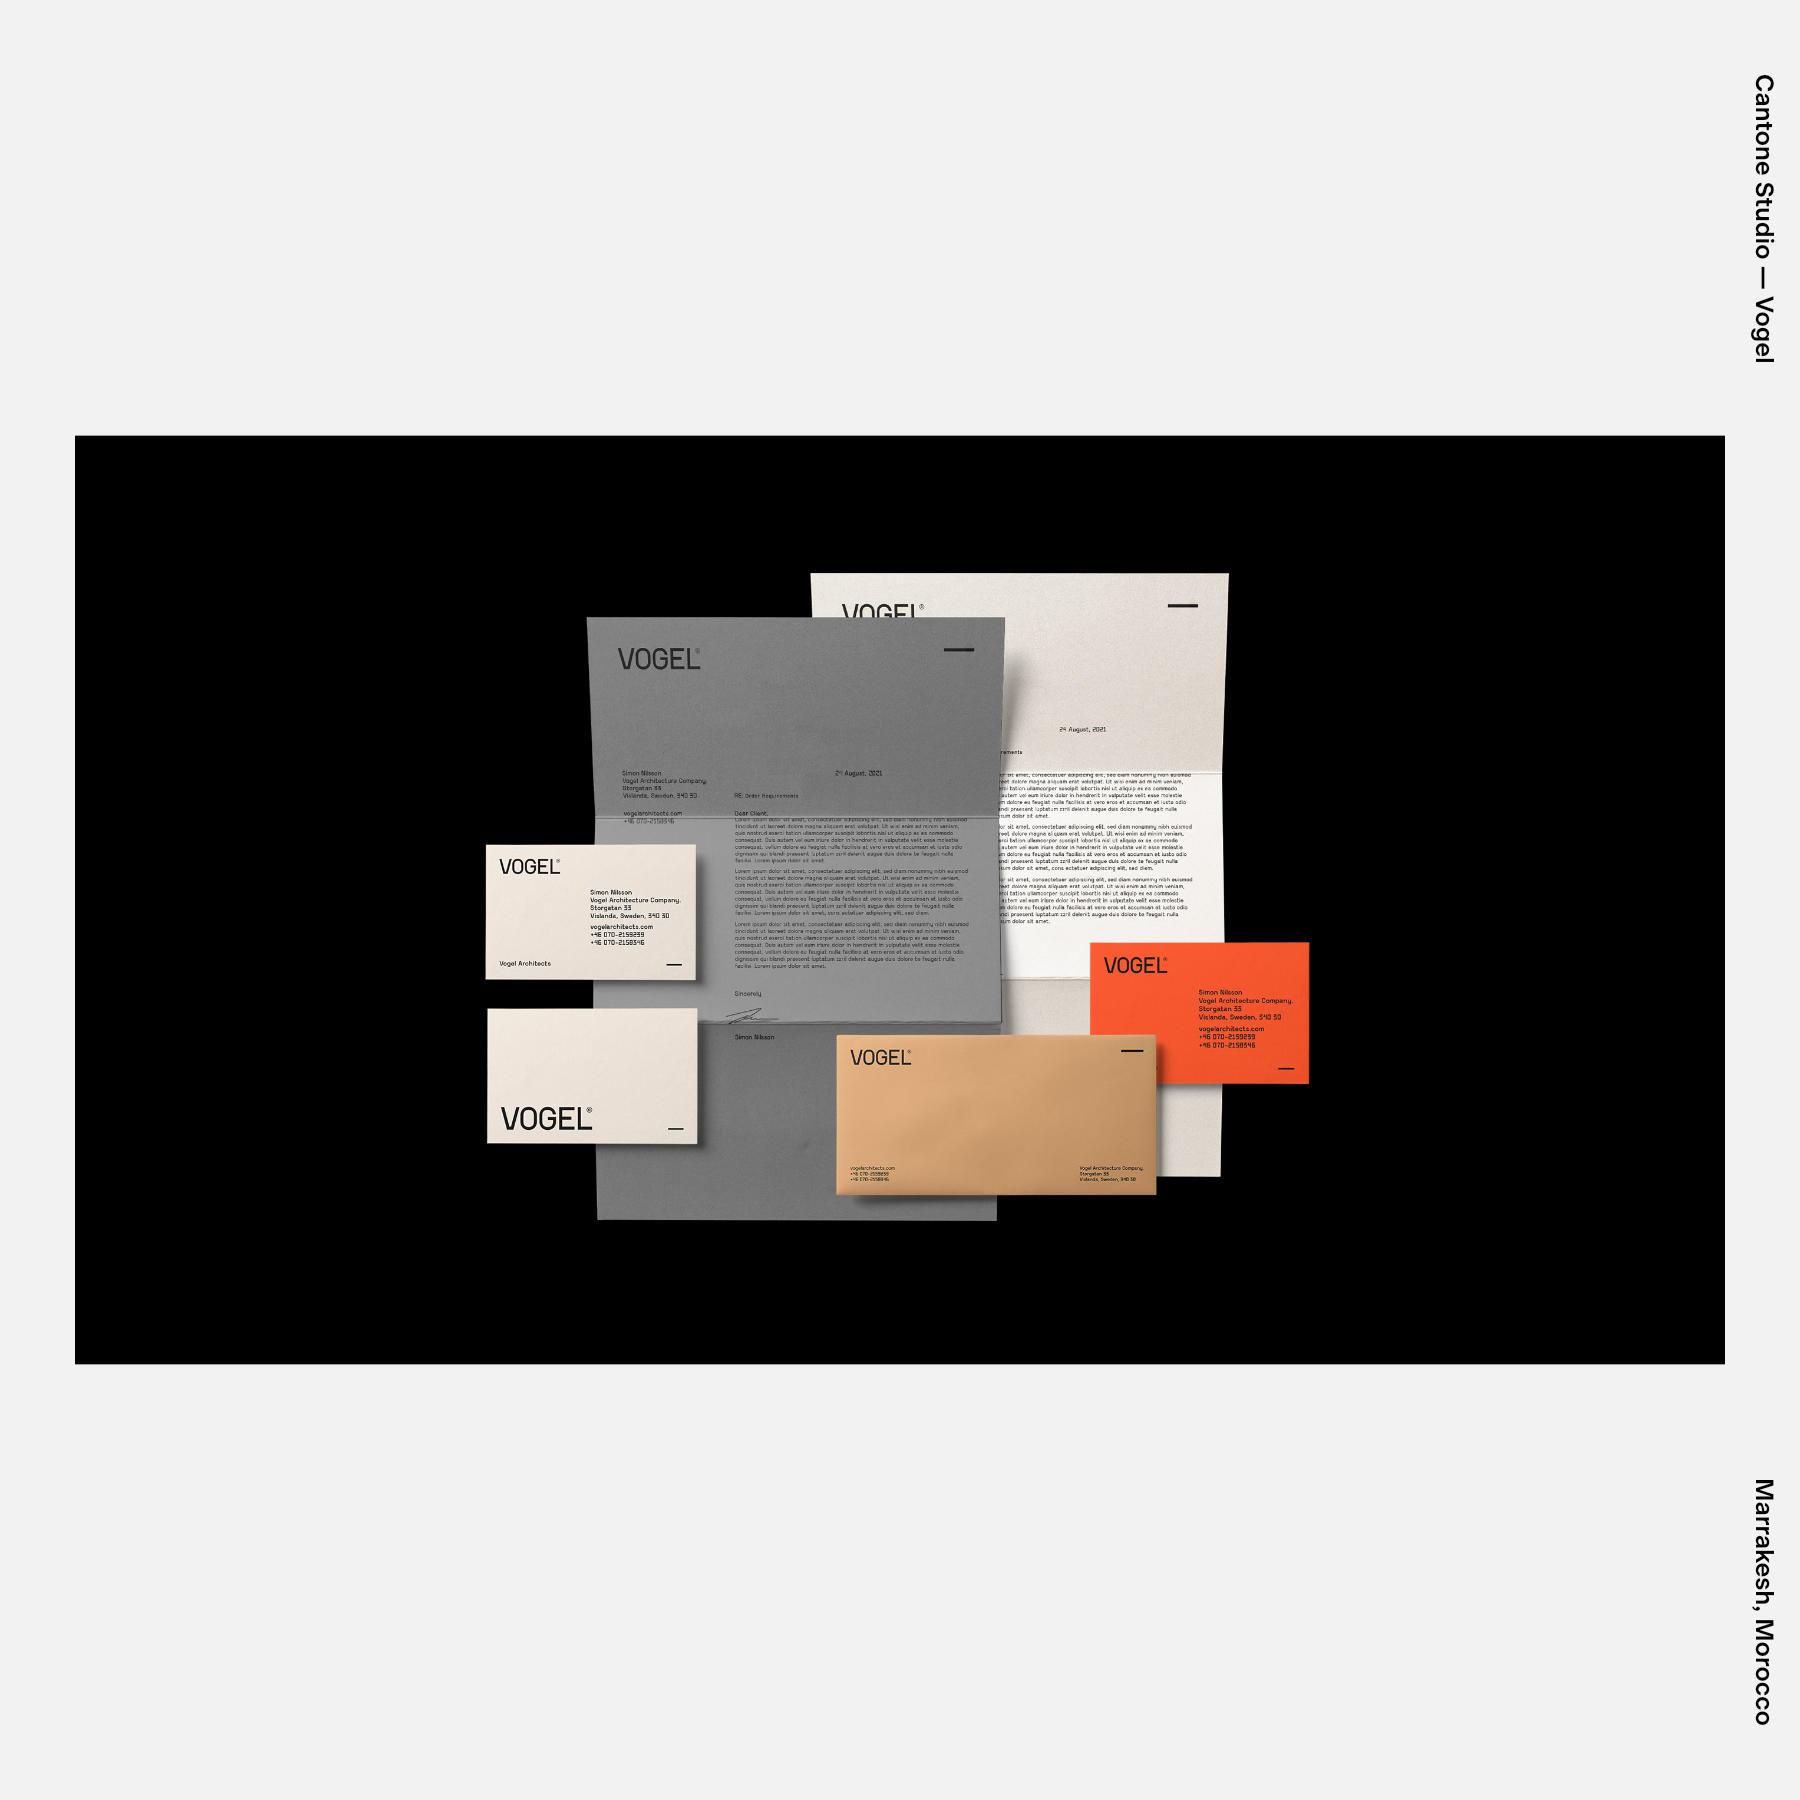 Cantone Studio — Vogel